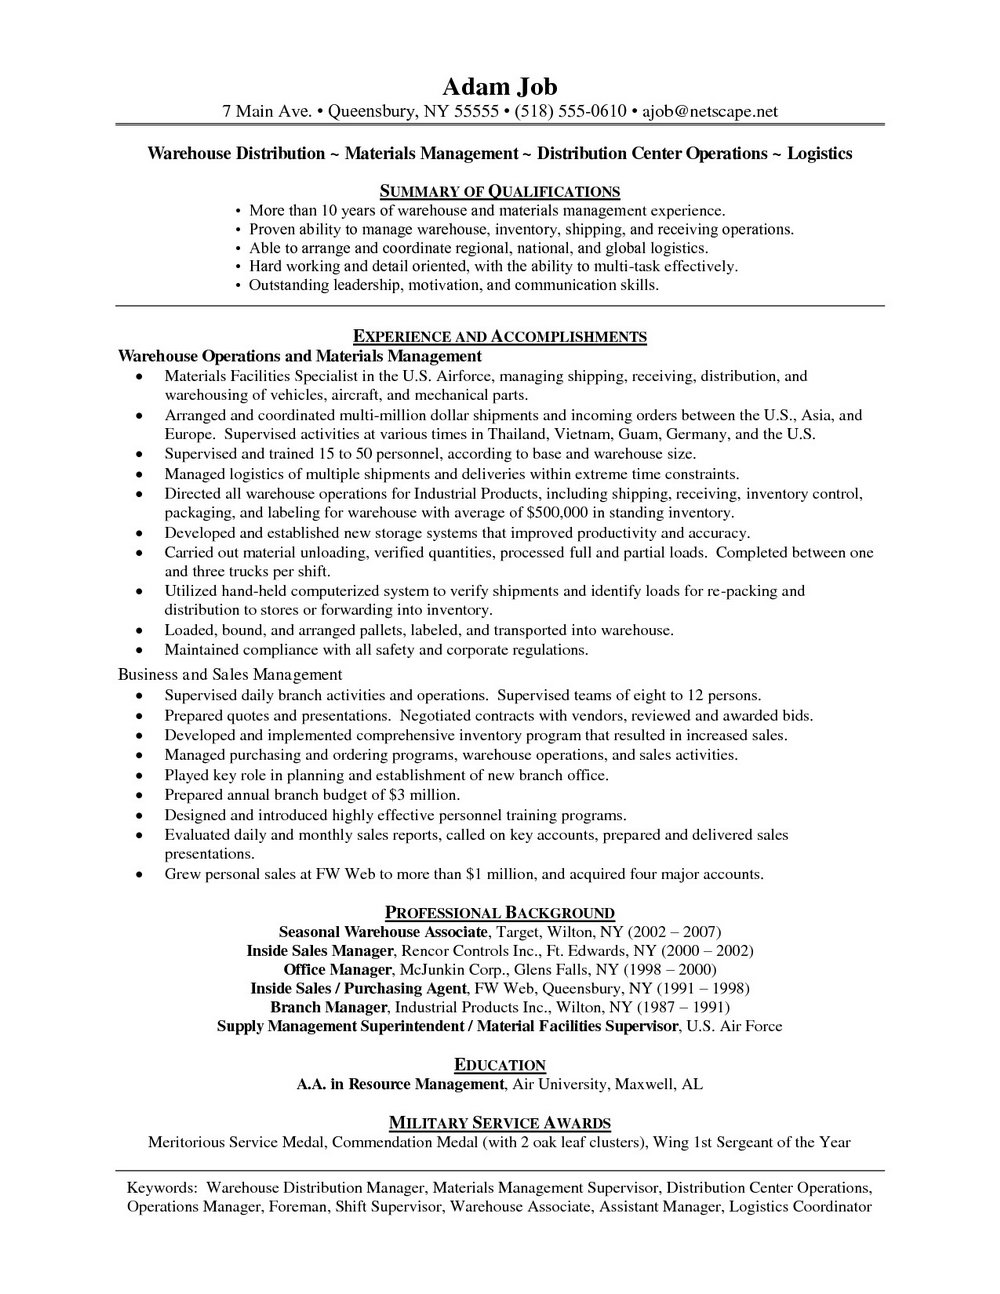 Sample Warehouse Resume Skills